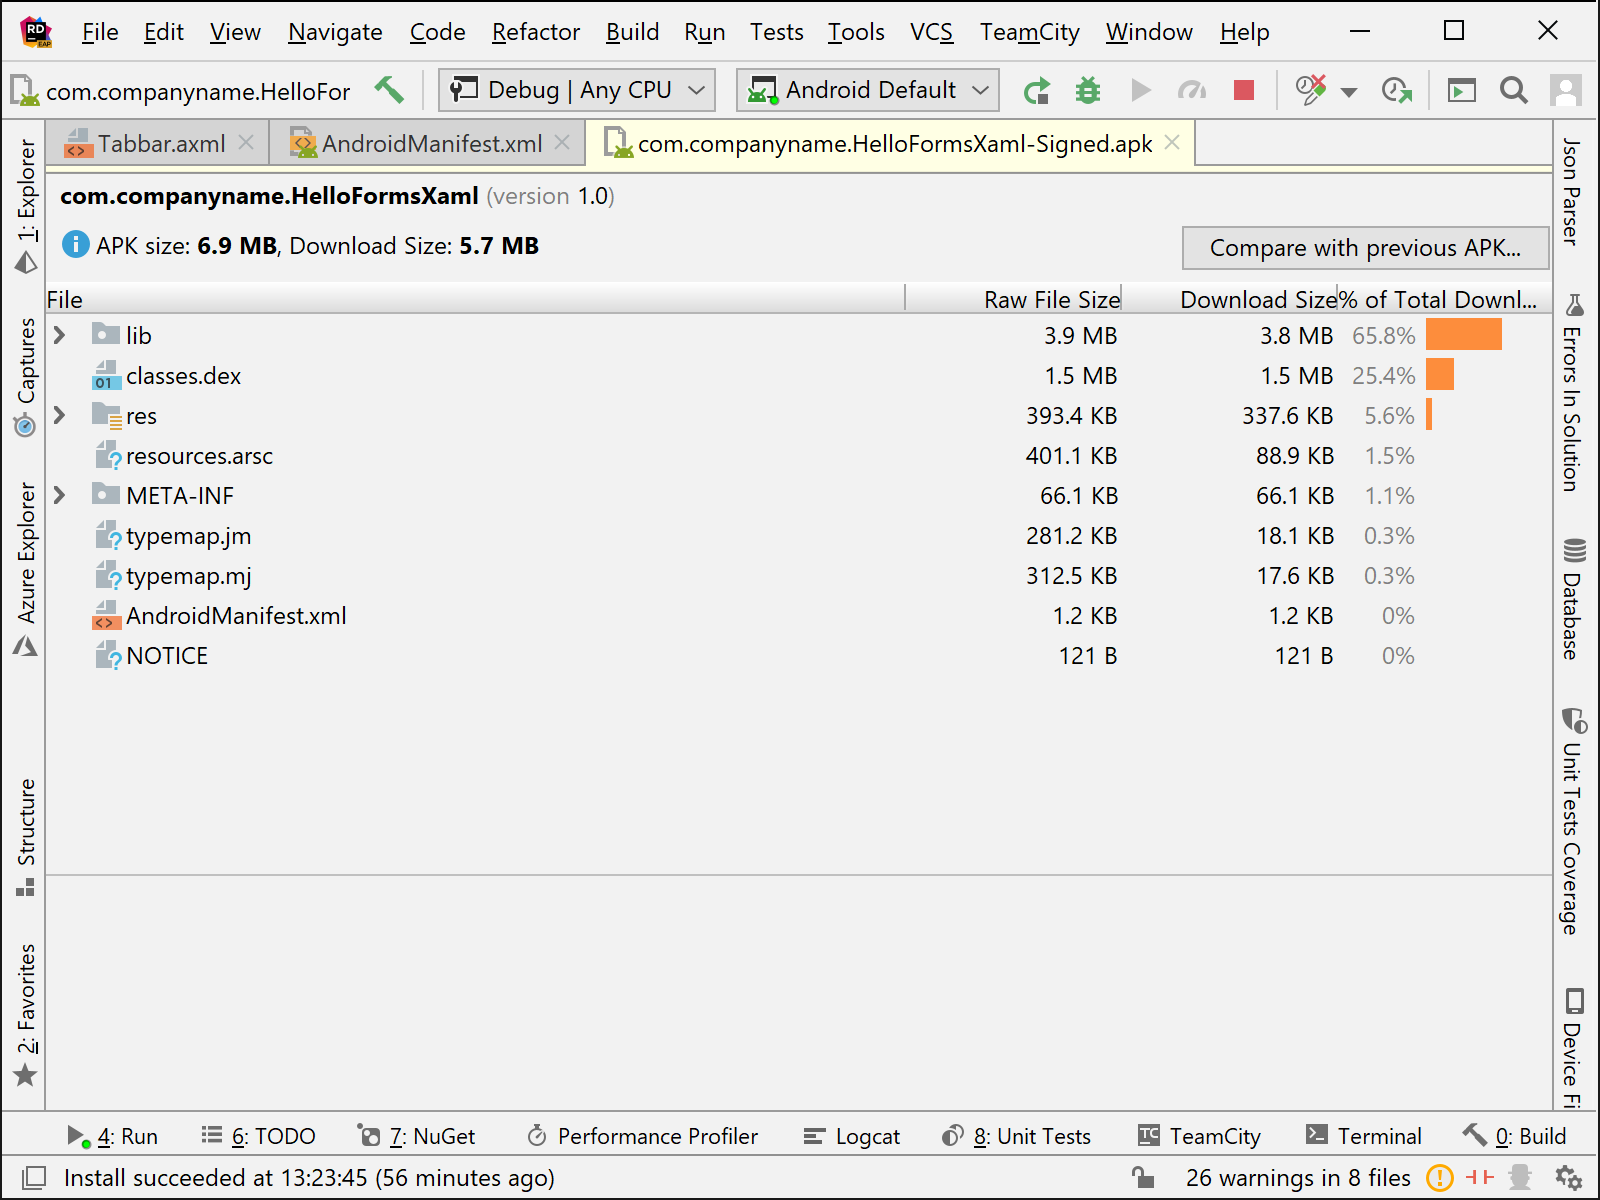 Rider's Xamarin Analyze APK Window